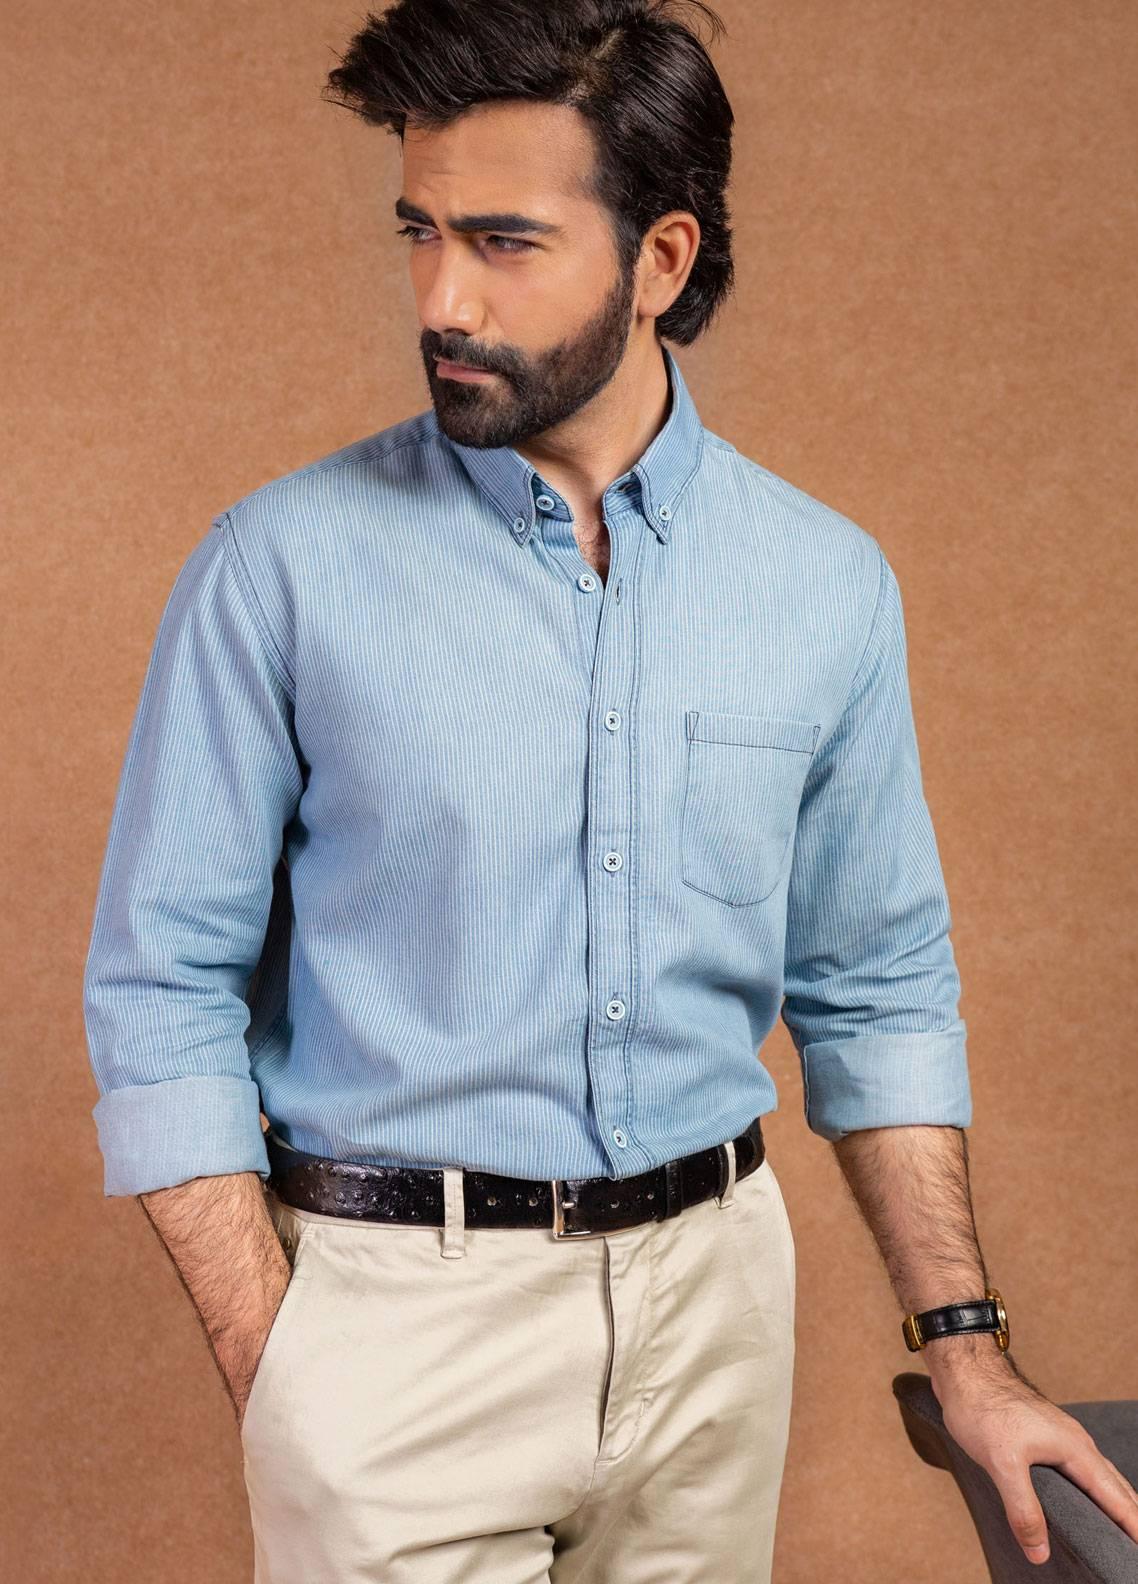 Brumano Cotton Formal Shirts for Men - Blue BRM-551